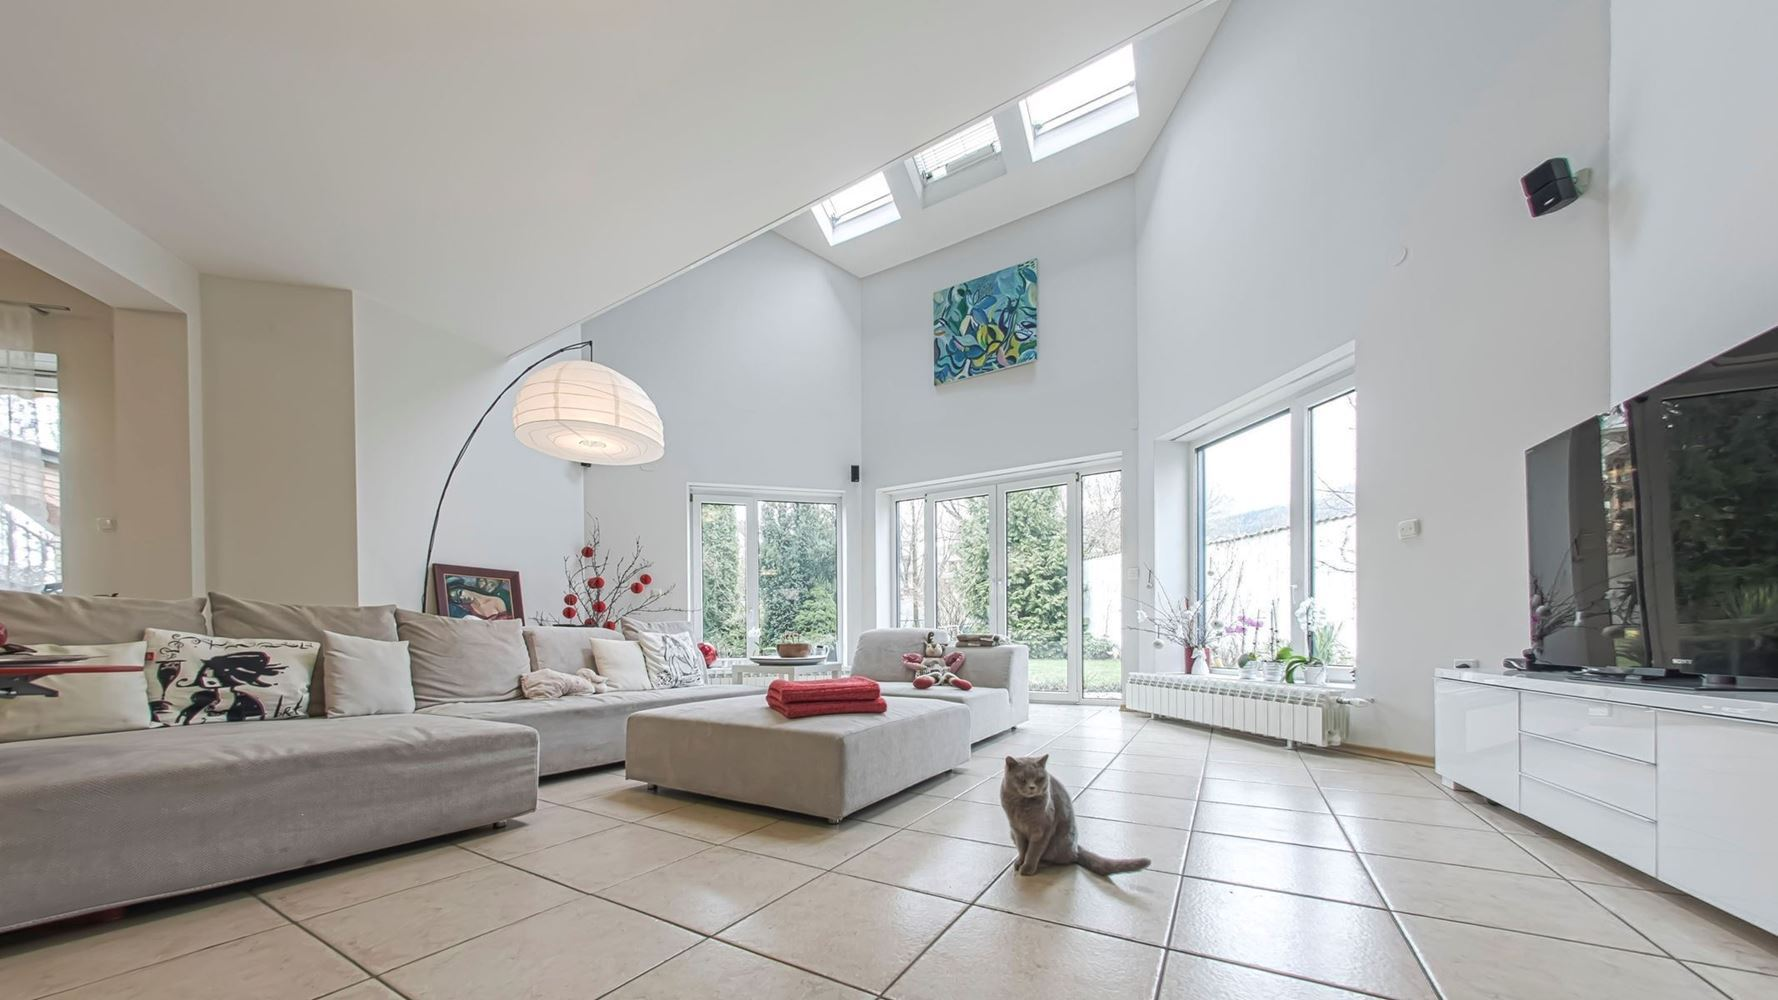 House for Sale, Dragalevtsi